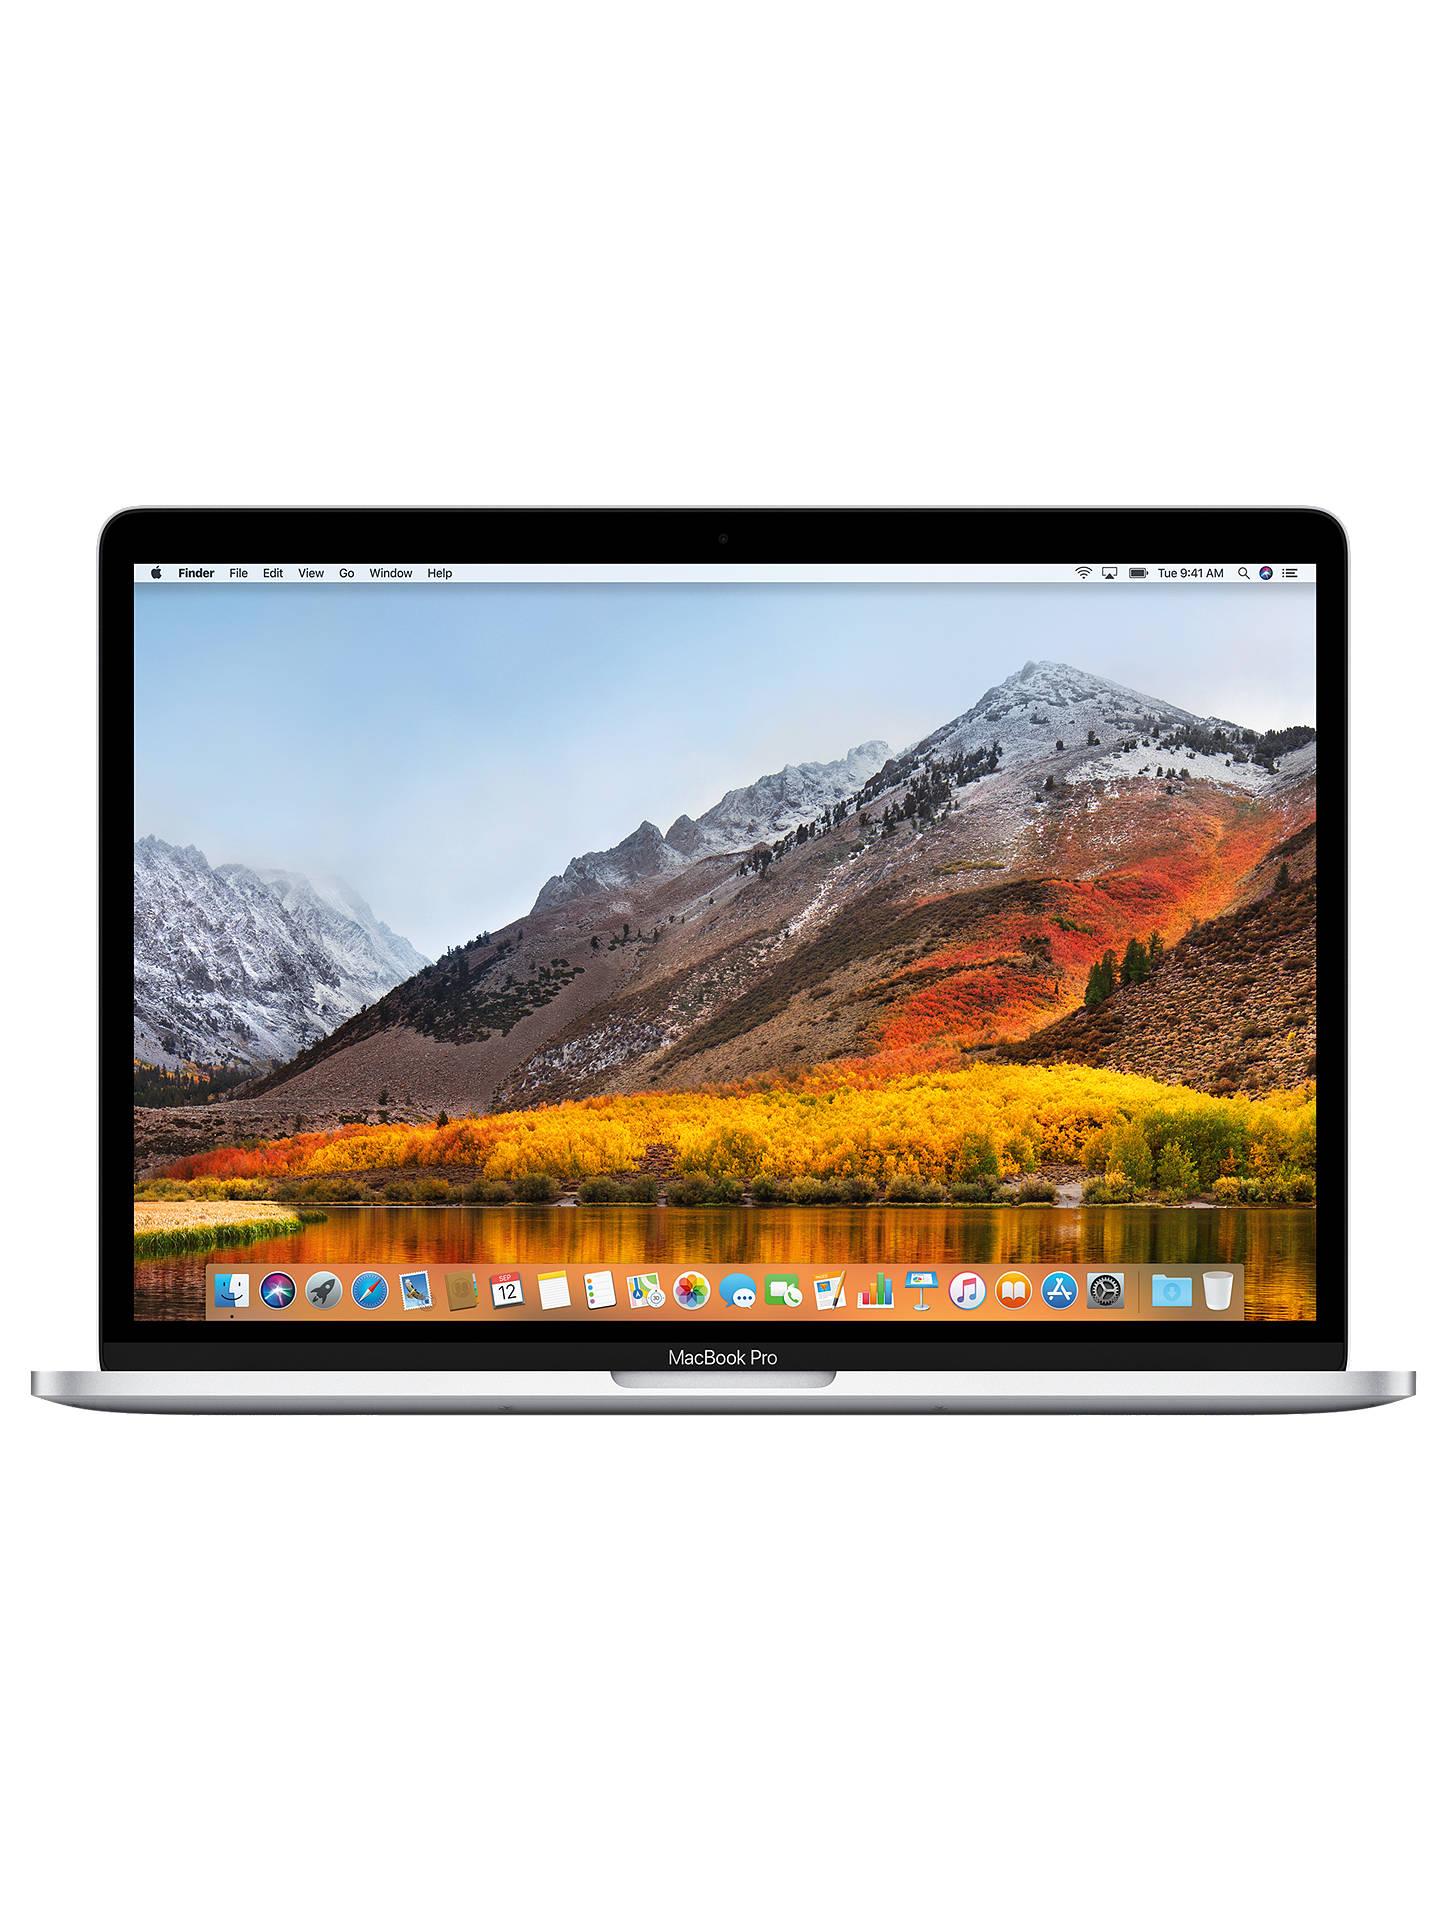 "2018 Apple MacBook Pro 15"" Touch Bar, Intel Core i7, 16GB RAM, 512GB SSD, Radeon Pro 560X, Silver"